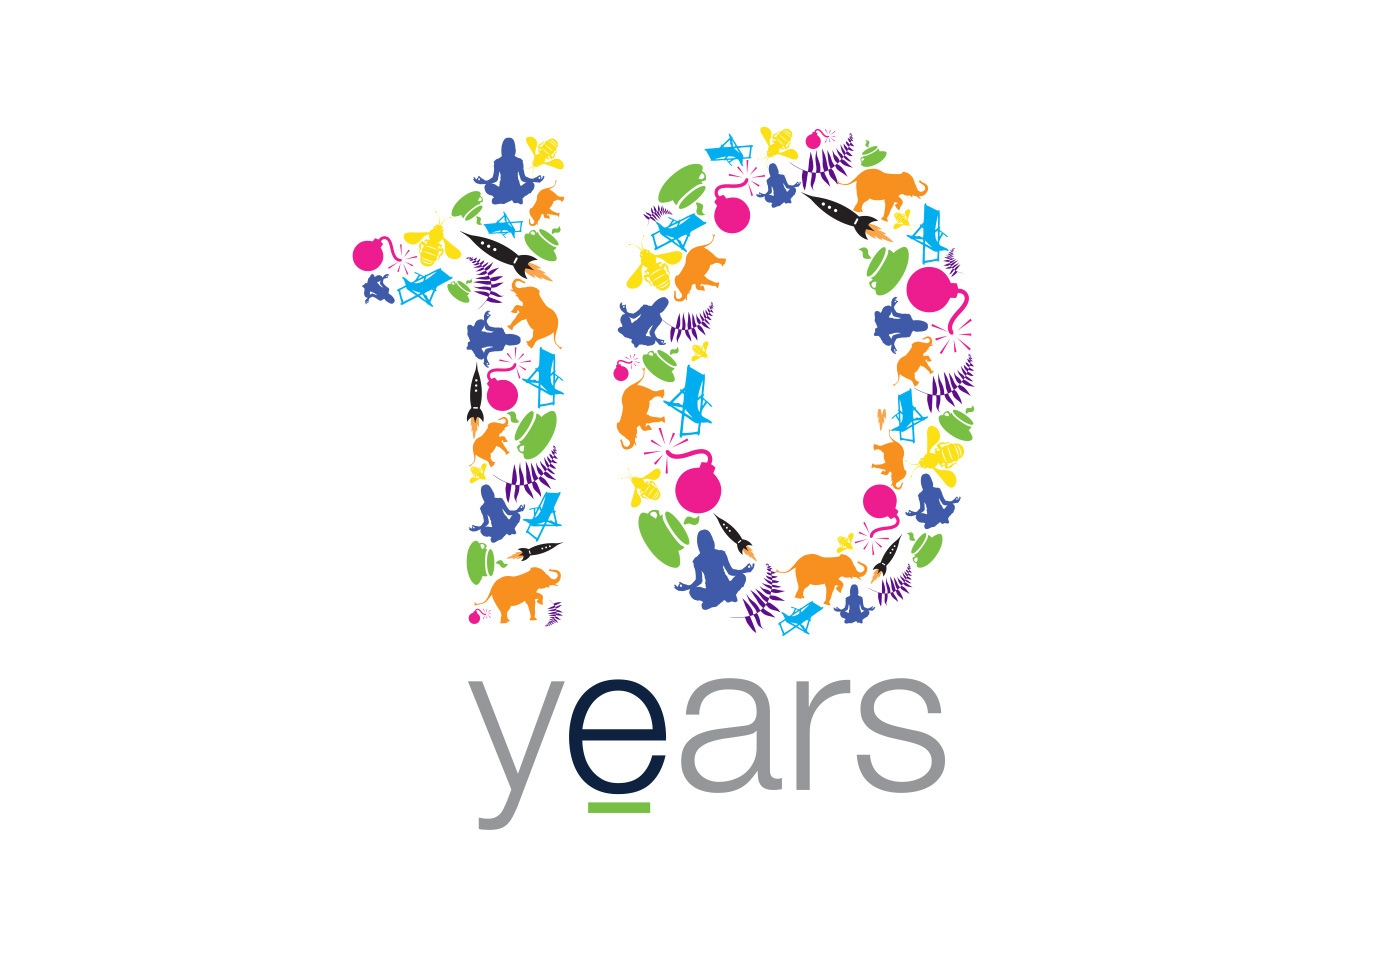 Melanie macpherson cgd ethical bean 10th anniversary logo altavistaventures Image collections